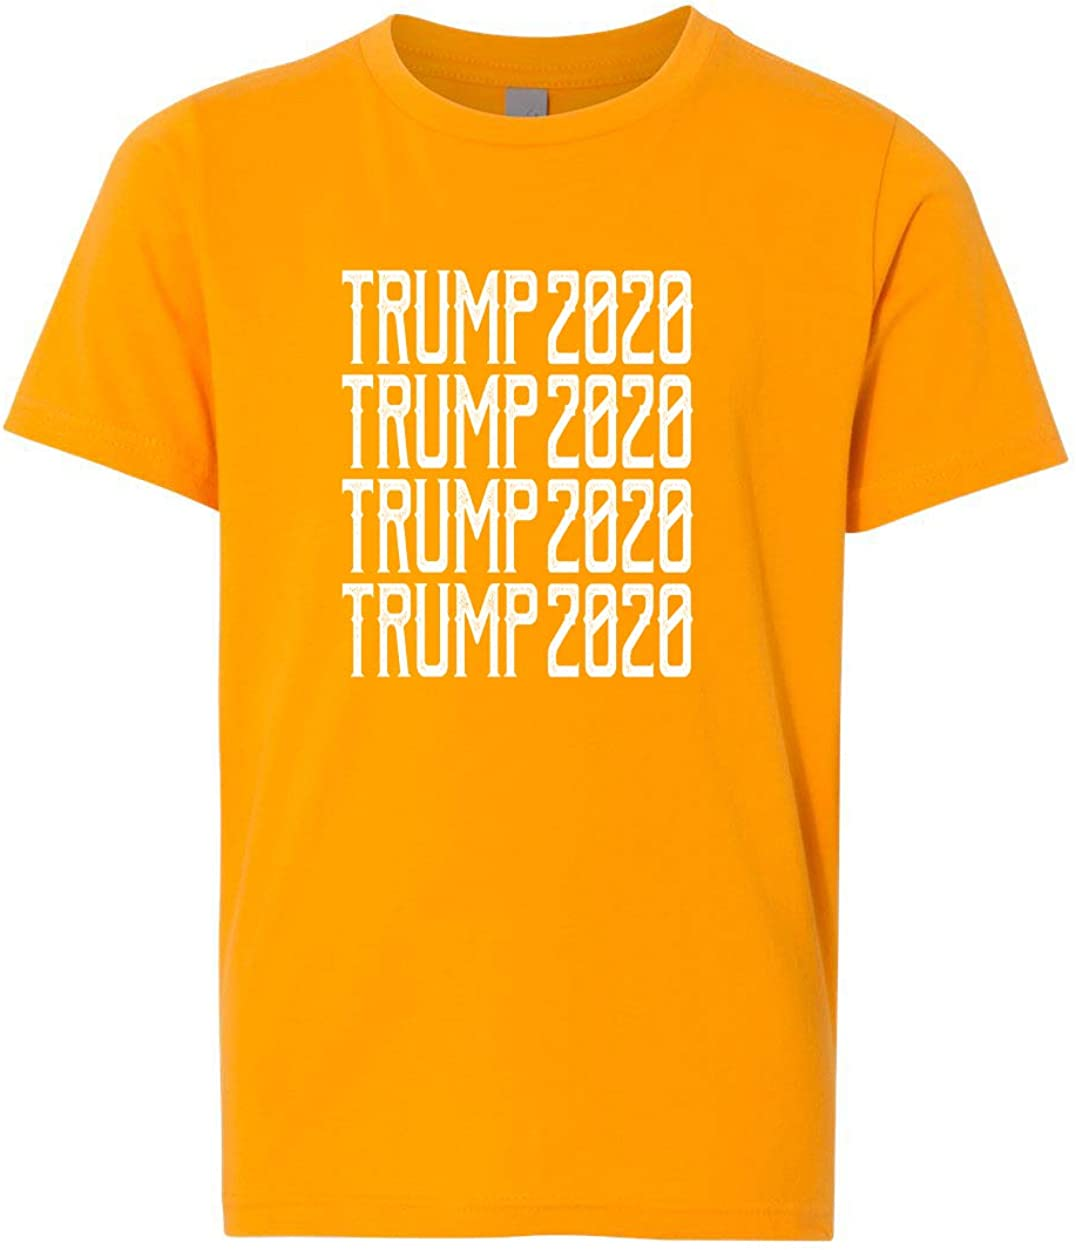 Custom Apparel R Us Trump 2020 Trump 2020 Boys Girls Graphic Tees Short Sleeve